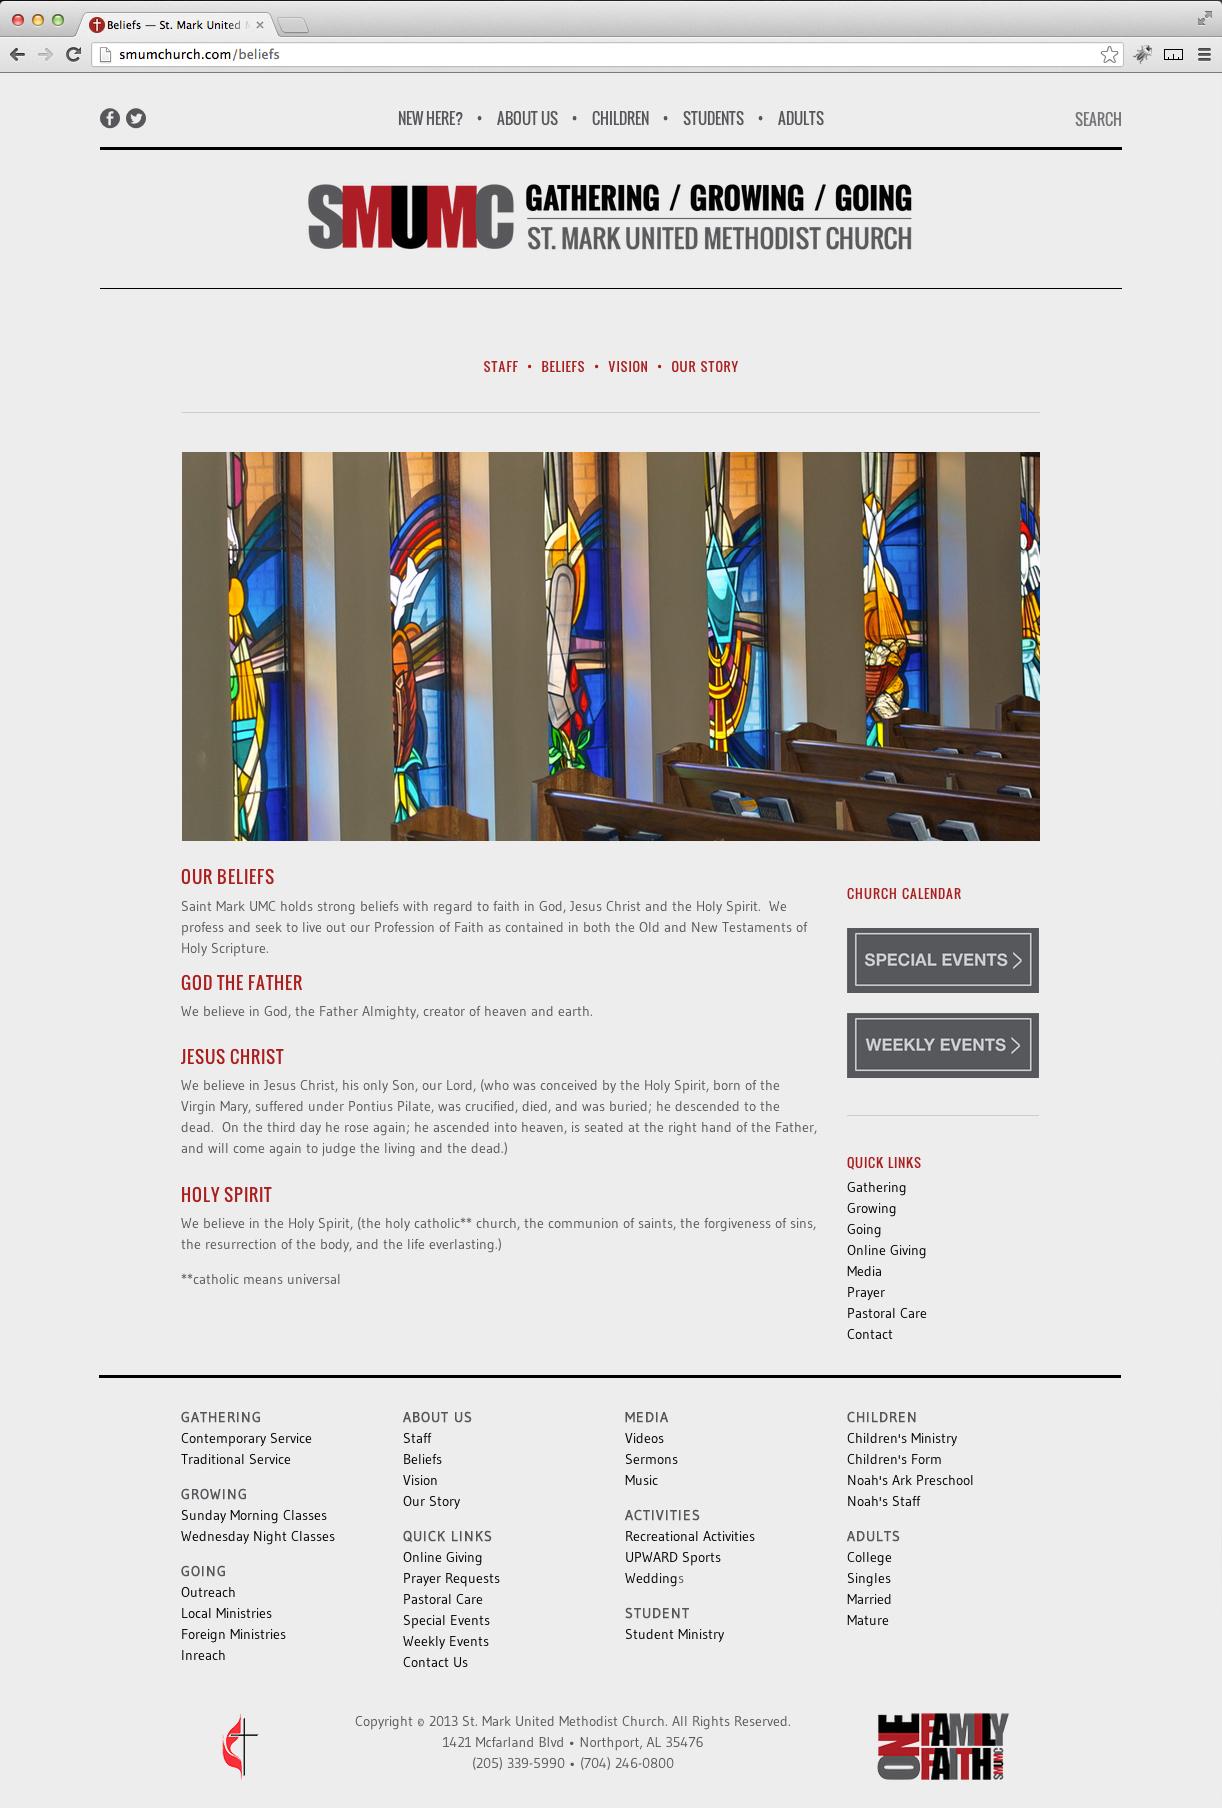 LanghoffCreative-KenoshaGraphicDesign-SMUMCwebsite10-photo.jpg